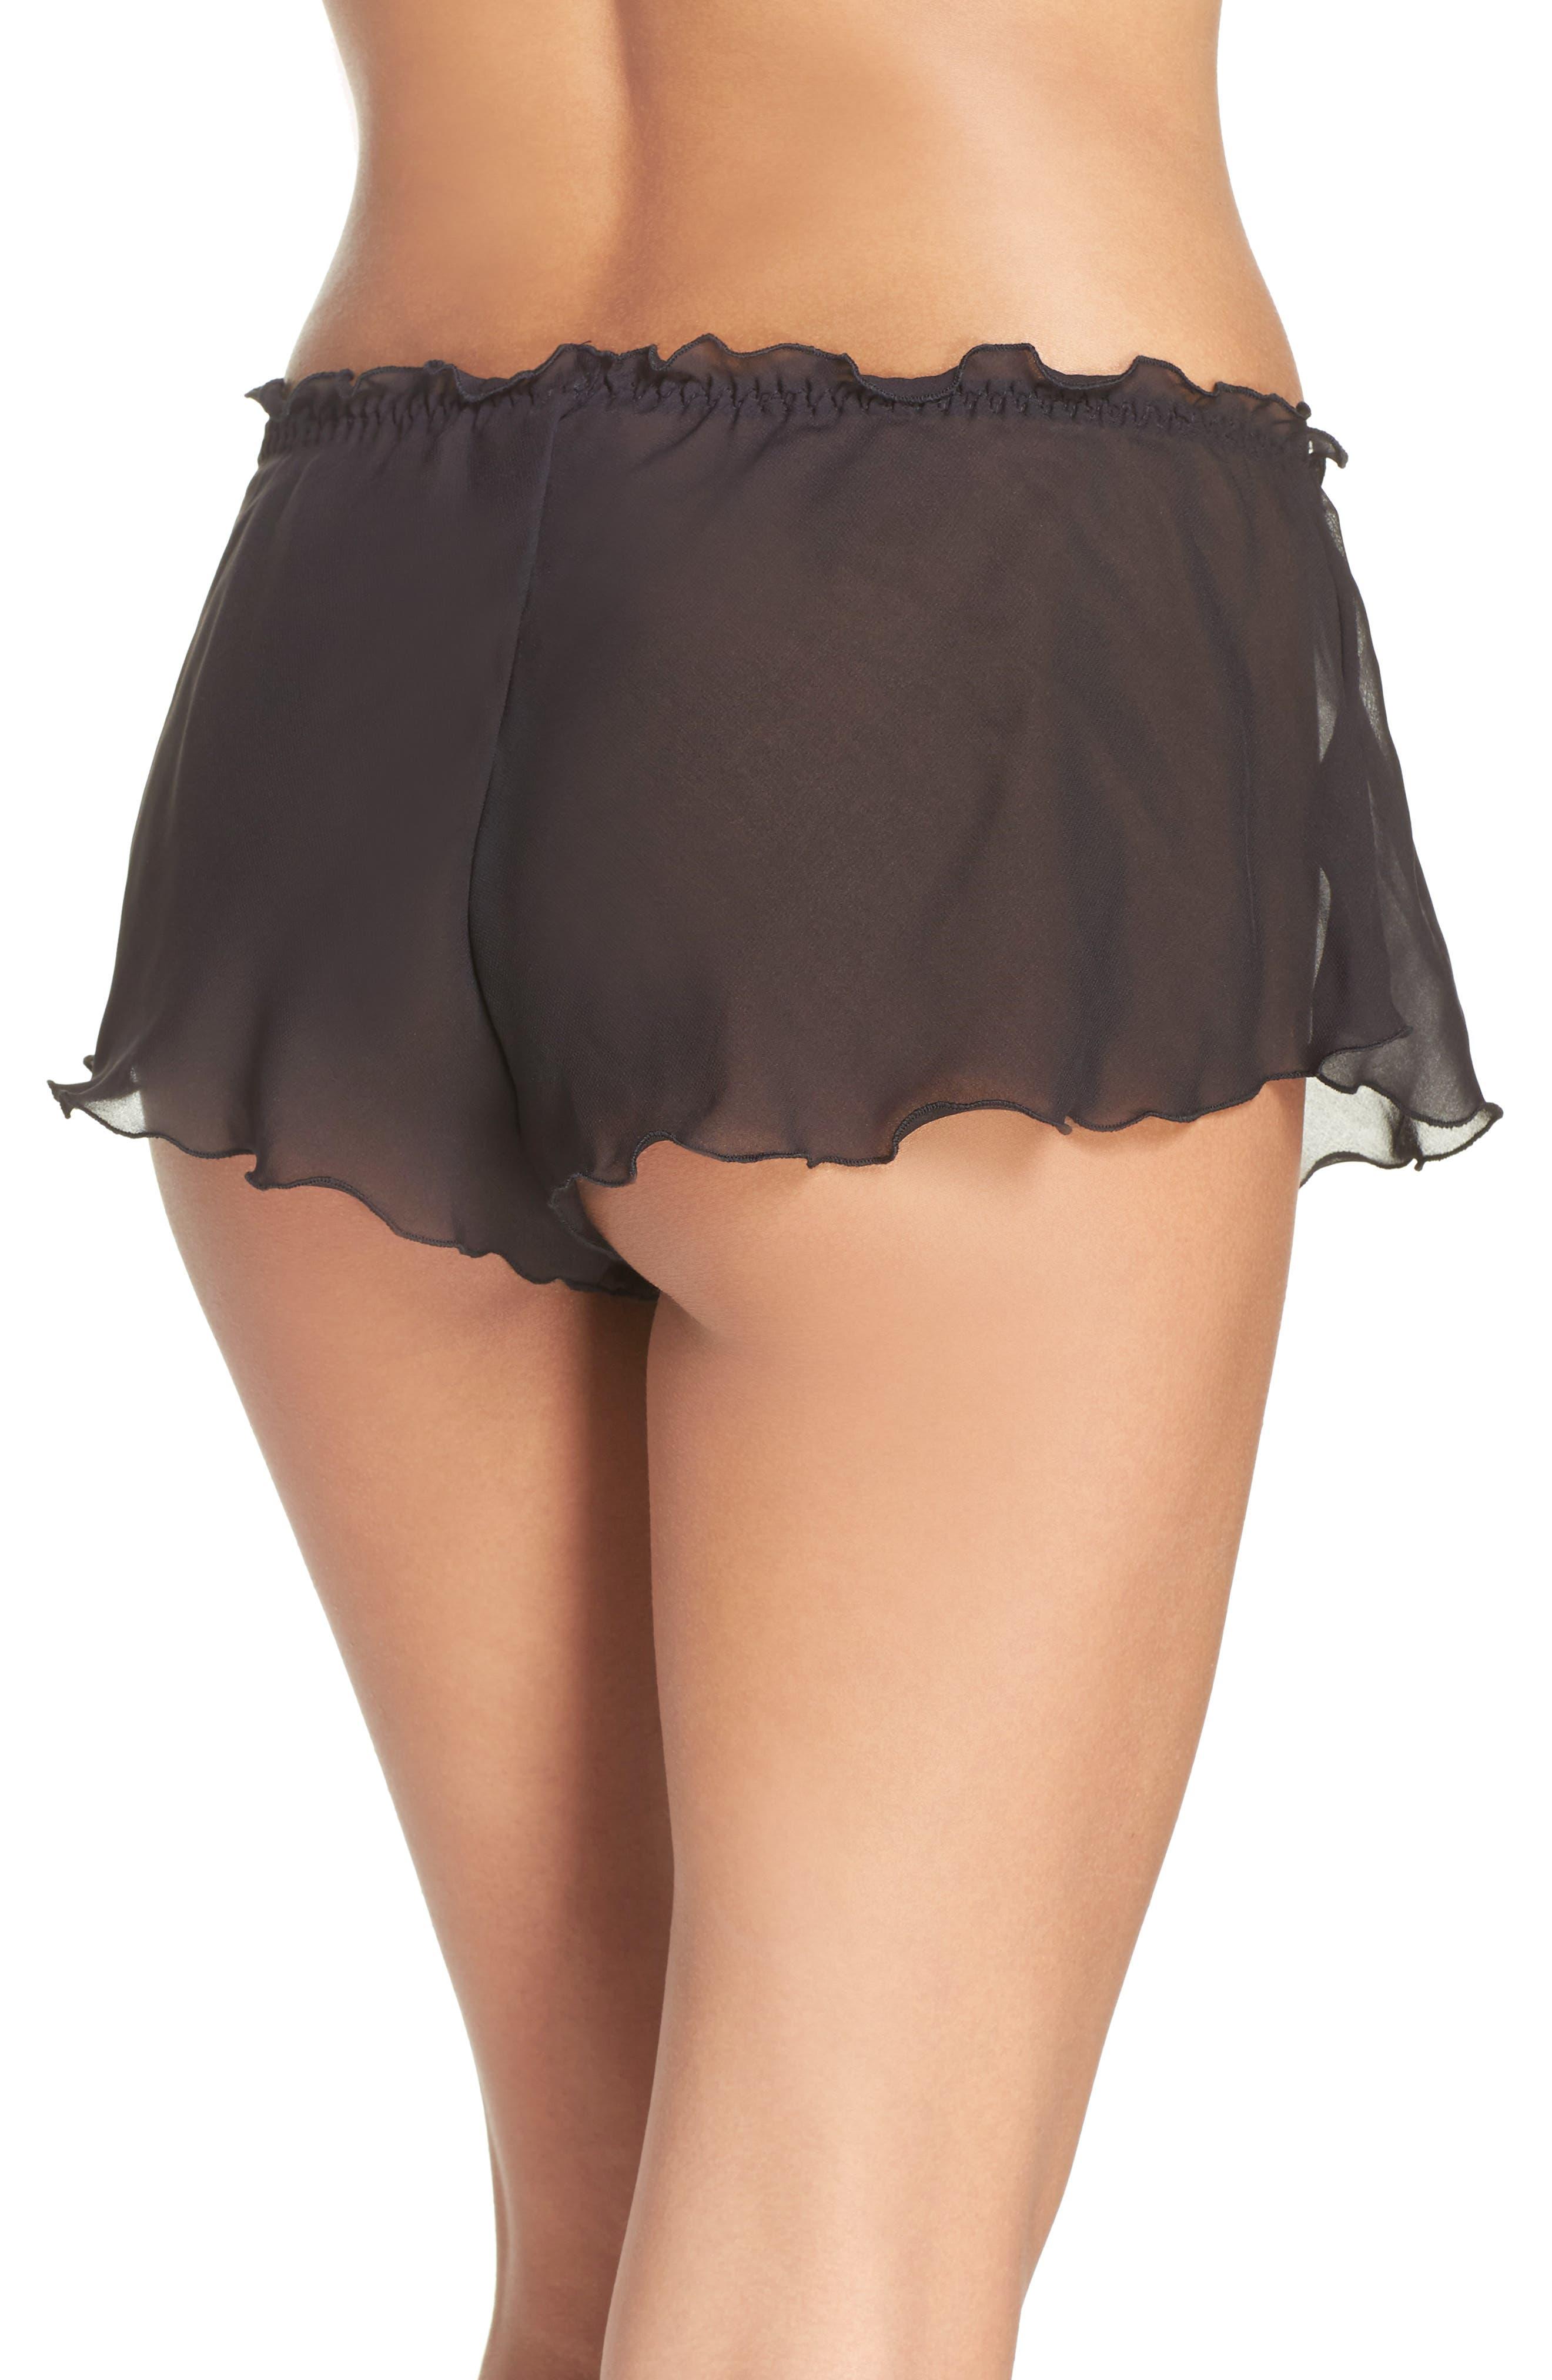 Chiffon Tap Shorts,                             Alternate thumbnail 2, color,                             001